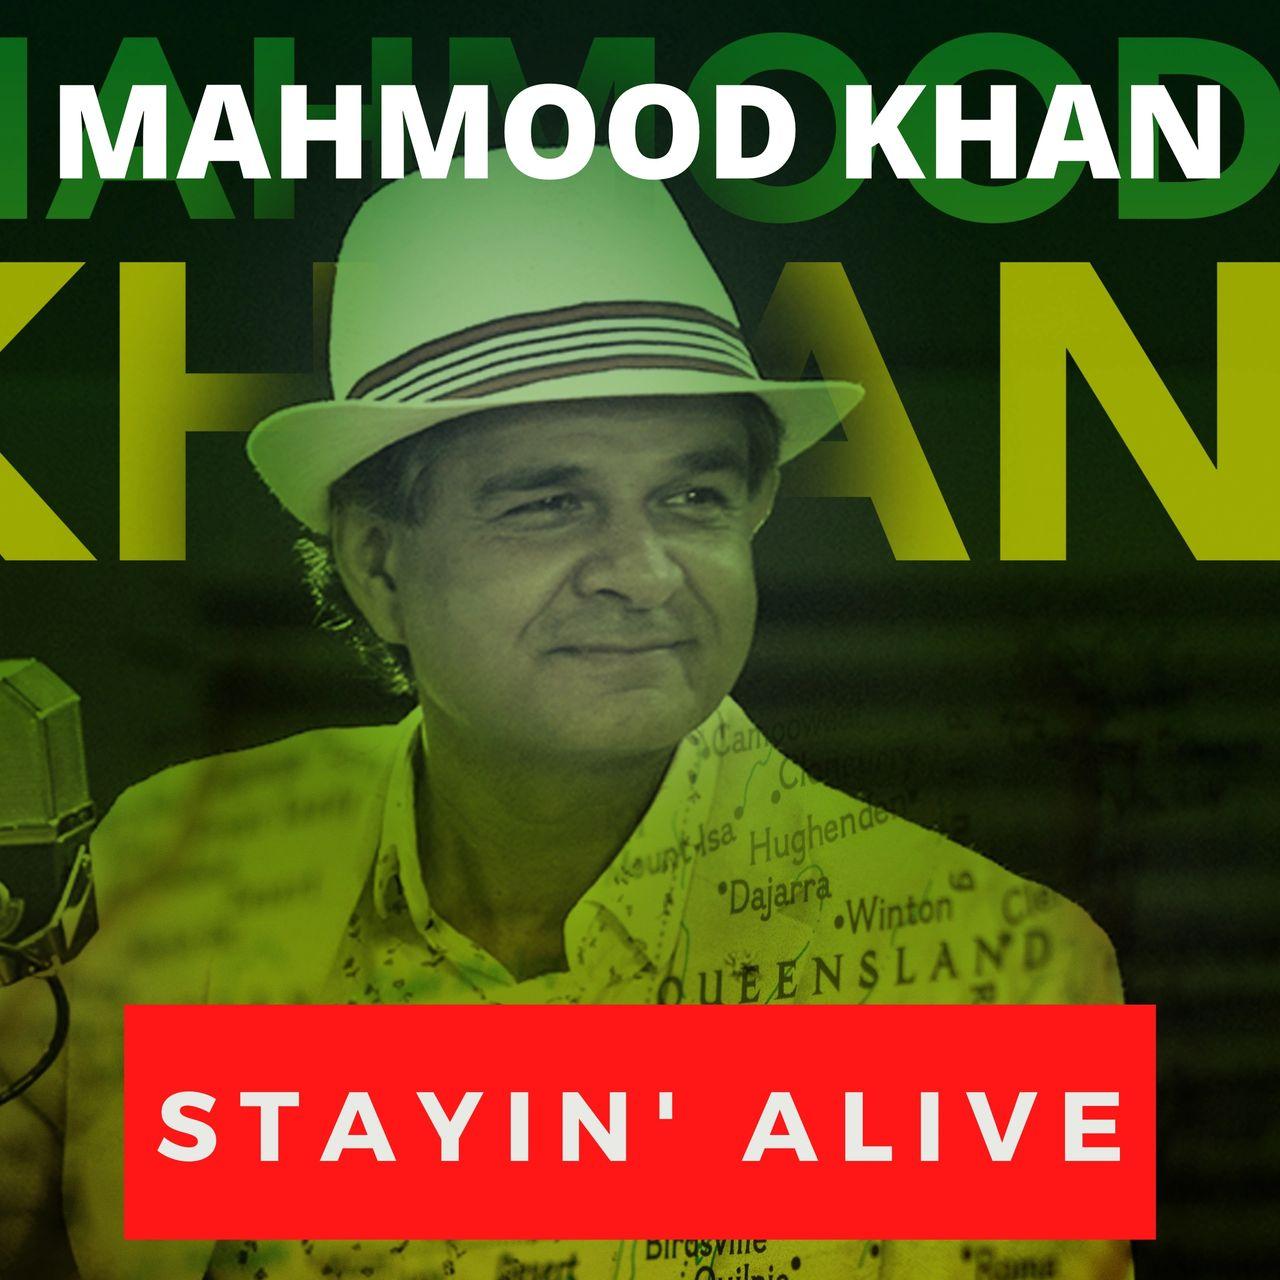 Mahmood Khan Ebook Stayin alive